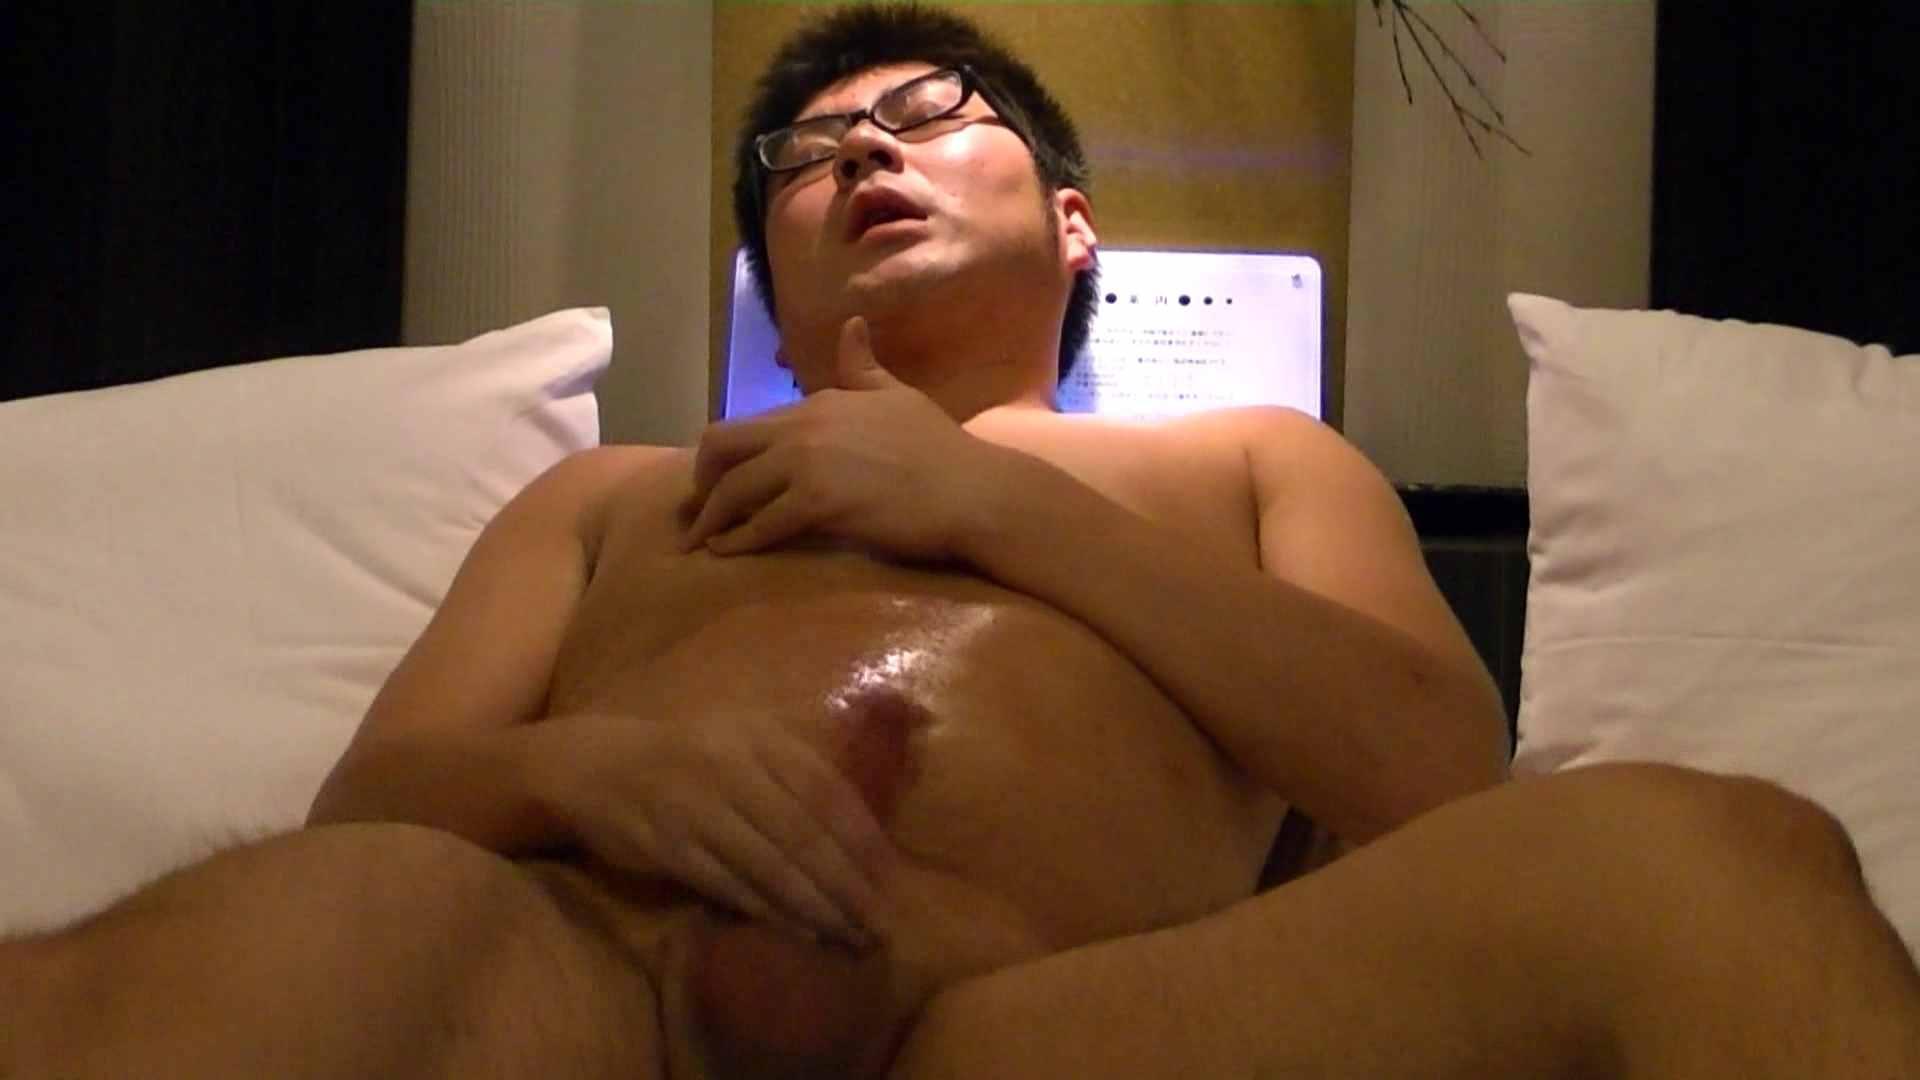 Mr.オナックスさん投稿!HD 貴方のオナニー三万円で撮影させてください。VOL.03 後編 完全無修正でお届け | オナニー特集  83pic 55